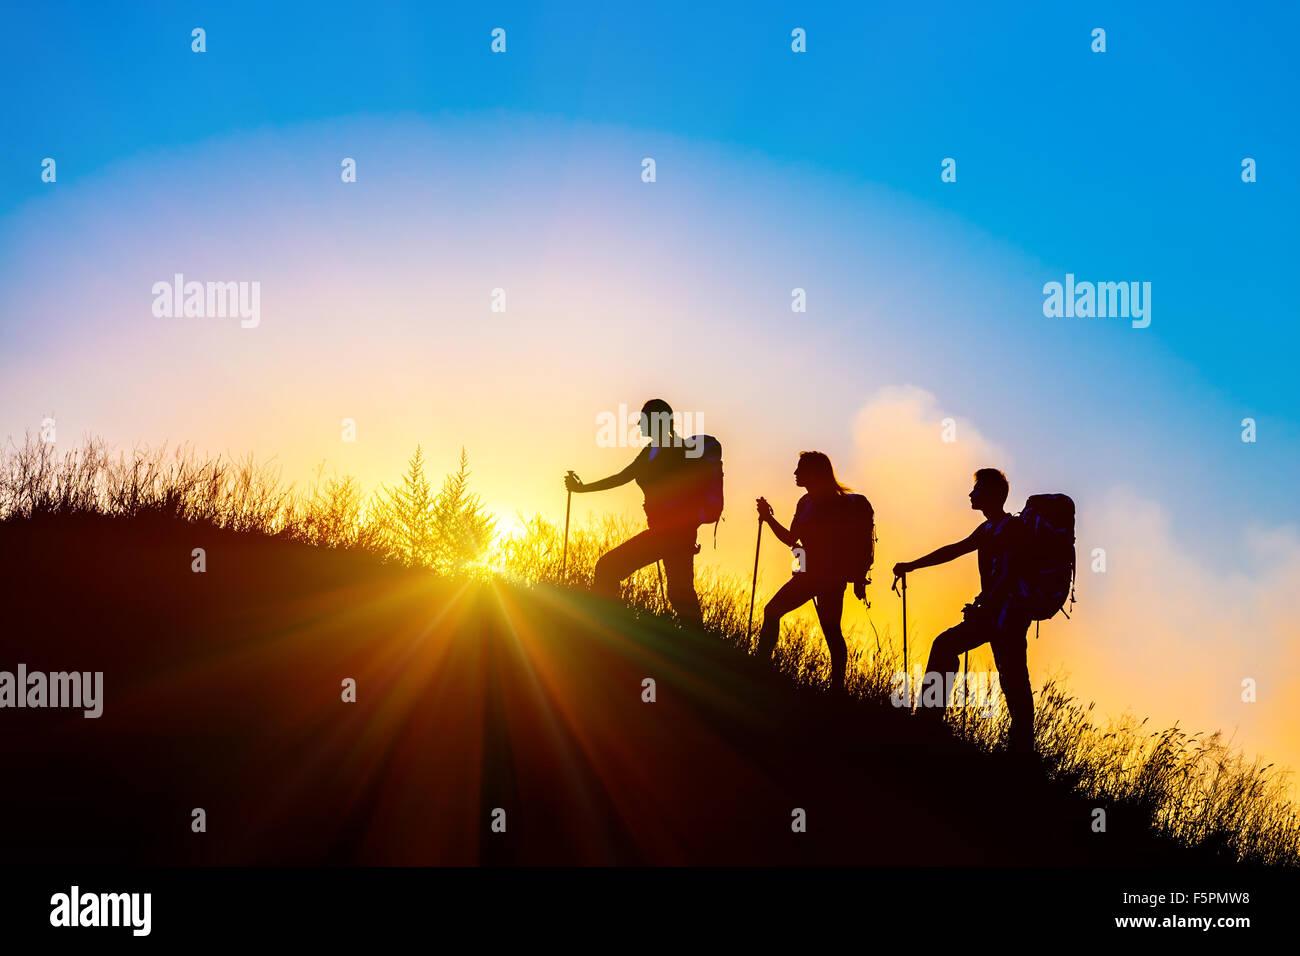 People meeting sunrise team building session - Stock Image